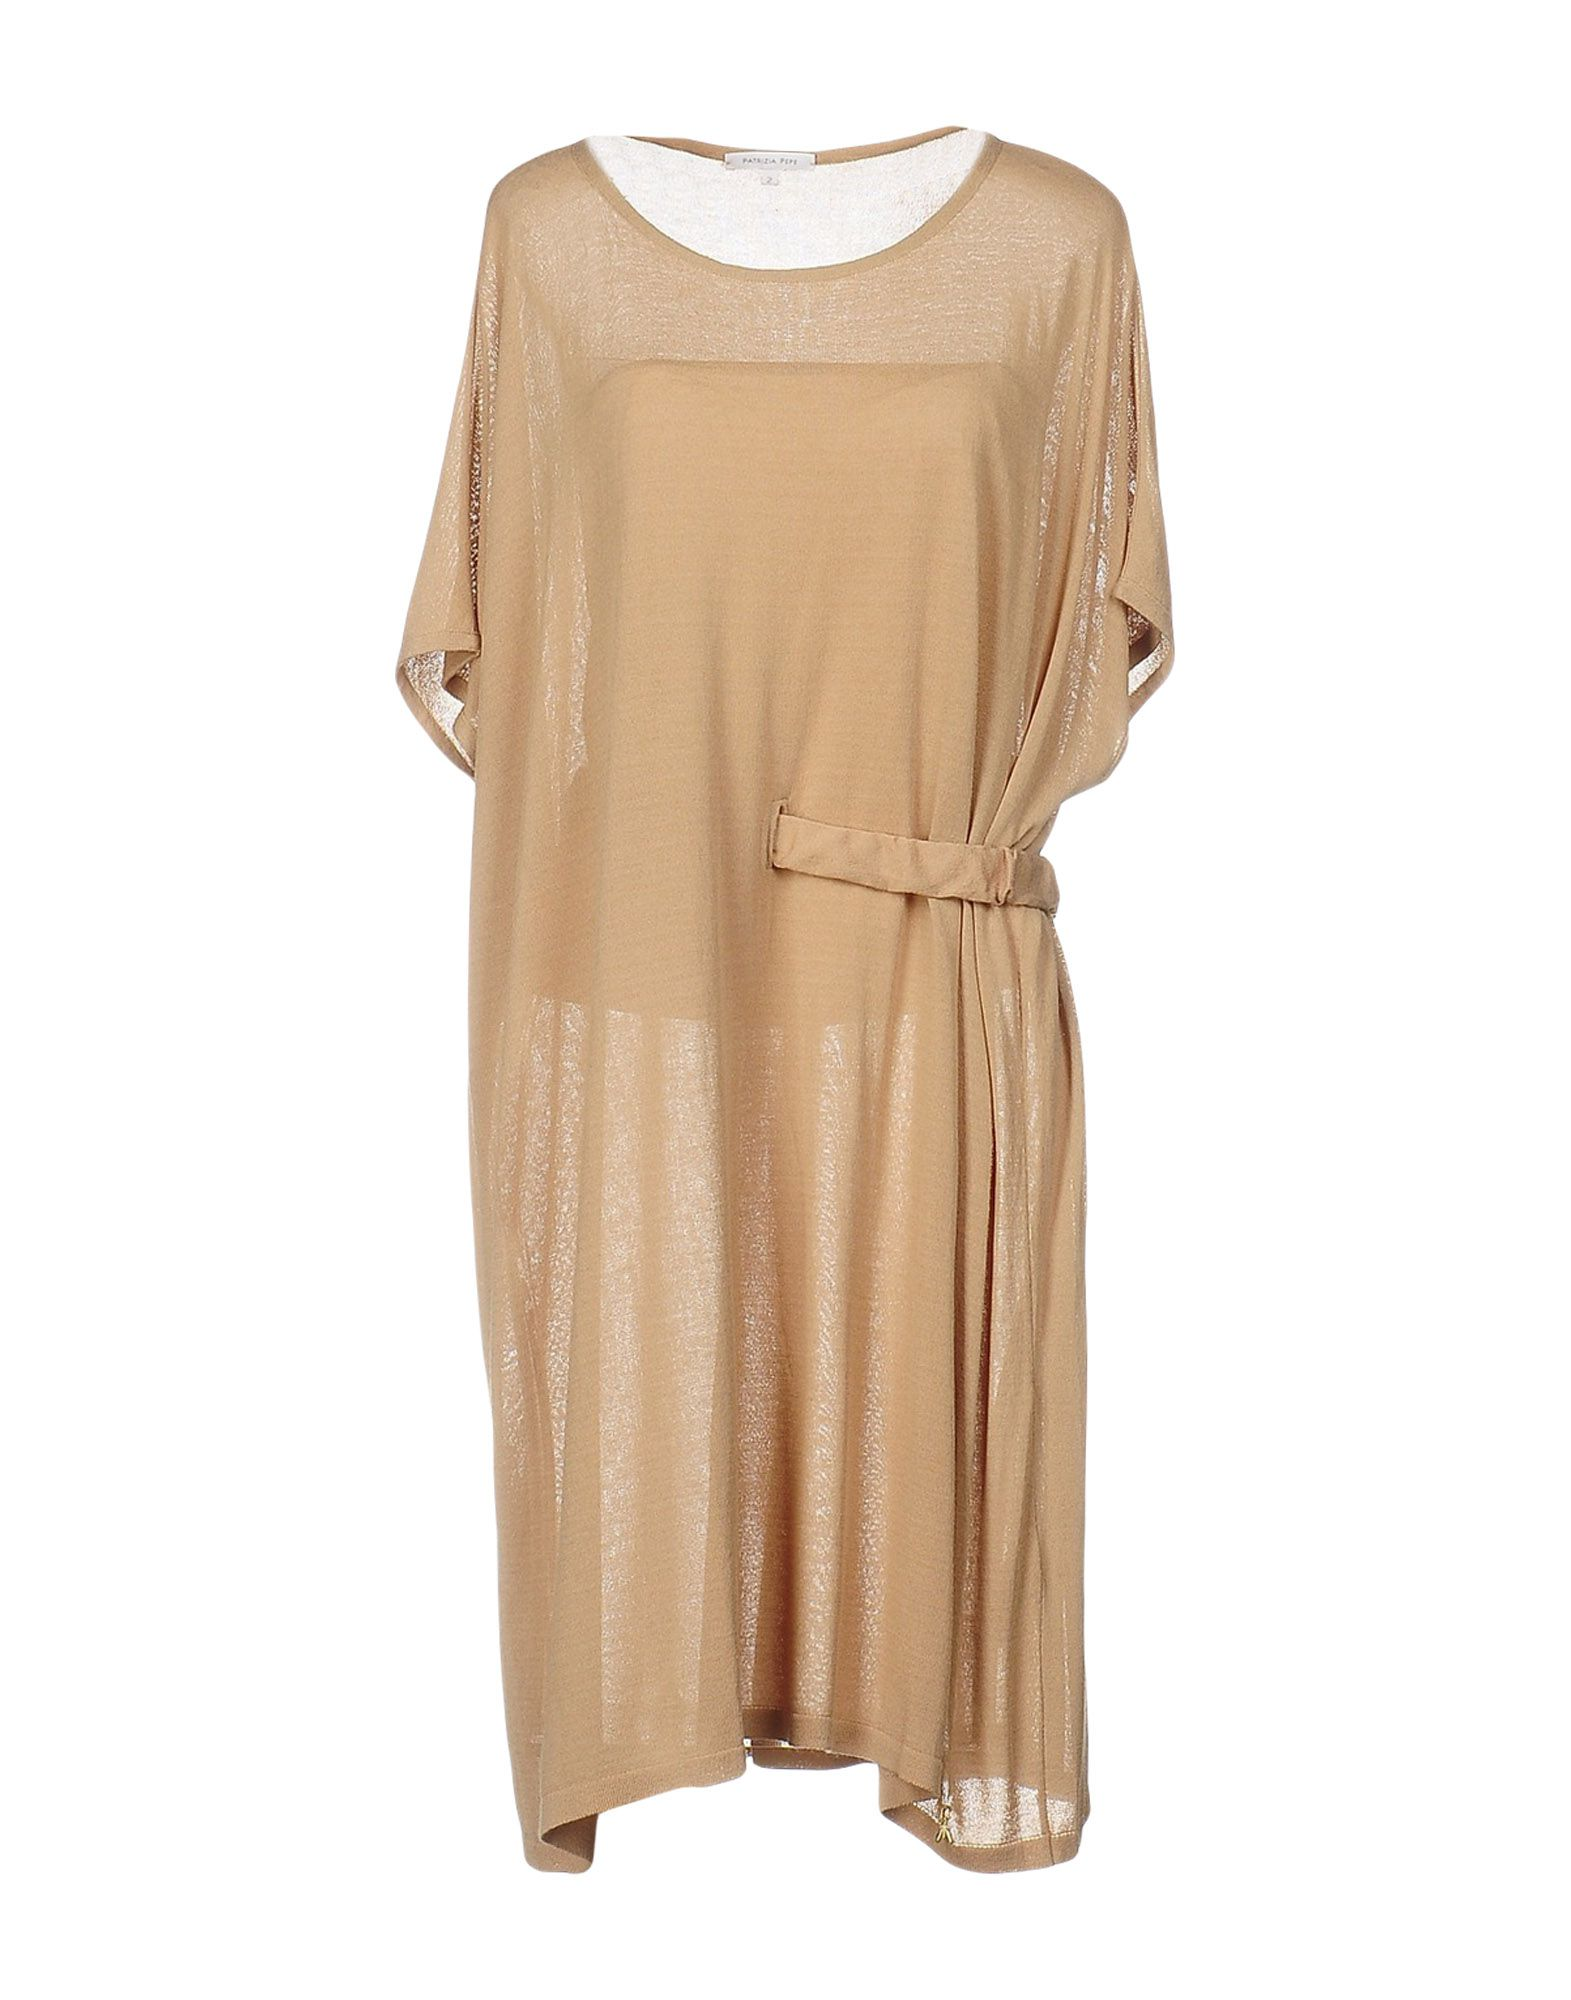 PATRIZIA PEPE - ROBES - Robes courtes